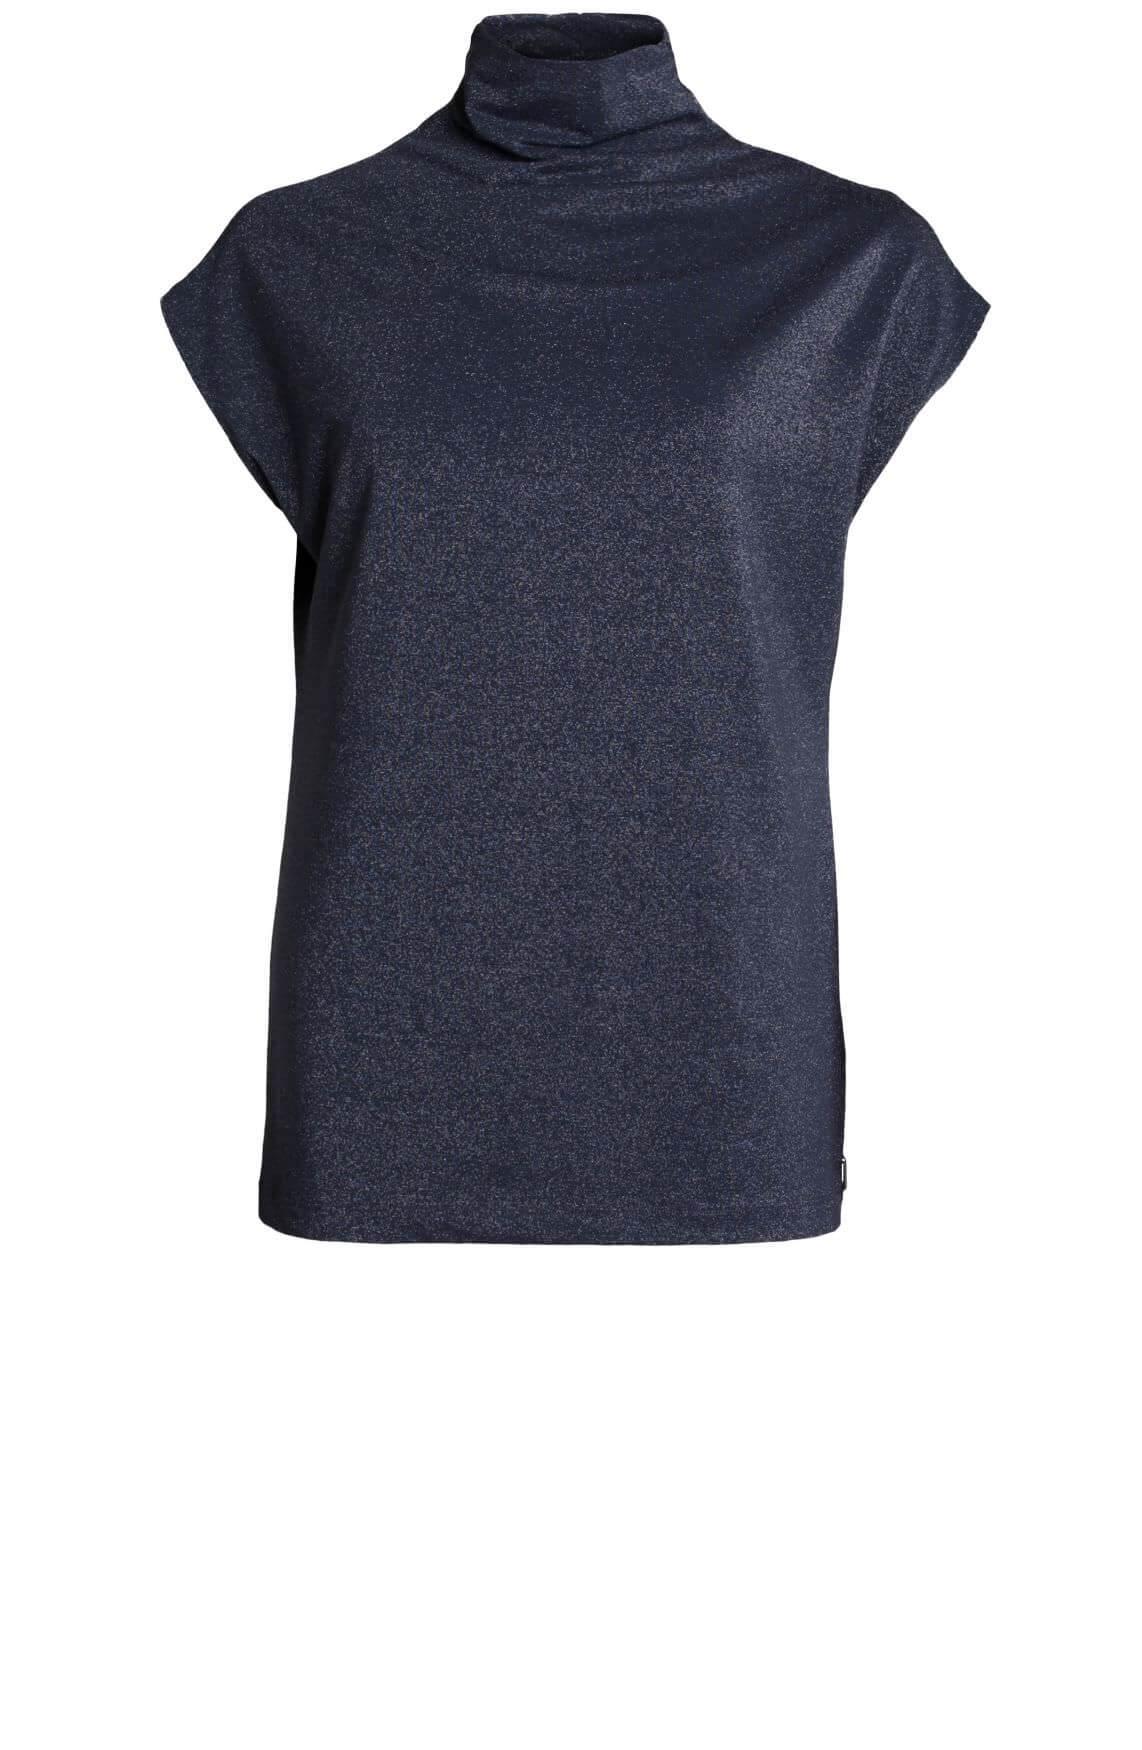 Anna Dames Glittershirt met col Blauw